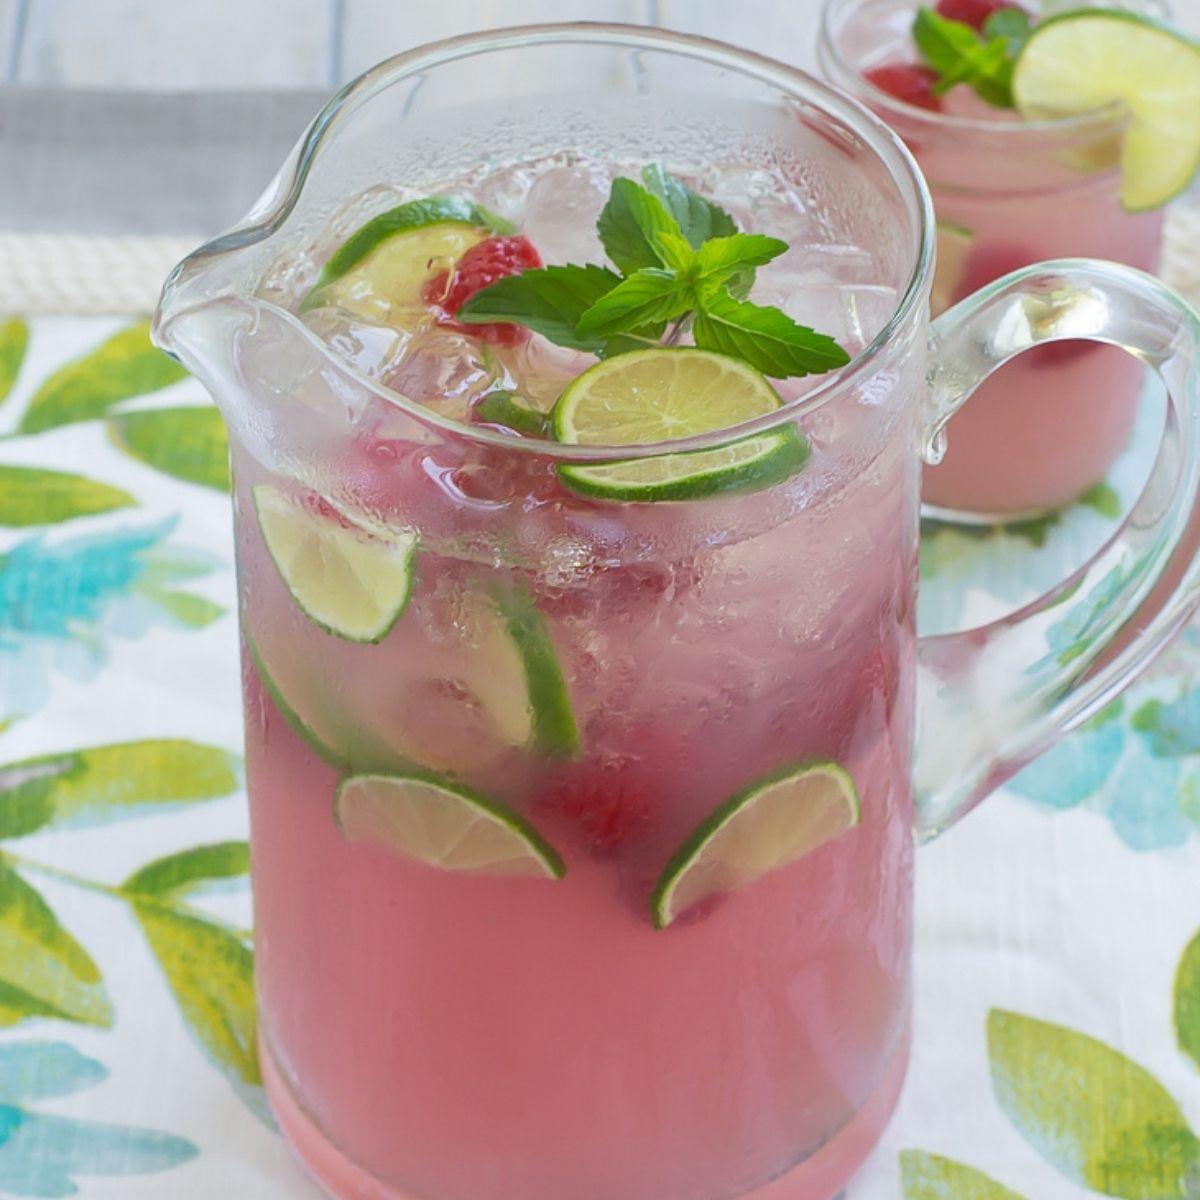 A glass pitcher full of pink lemonade.